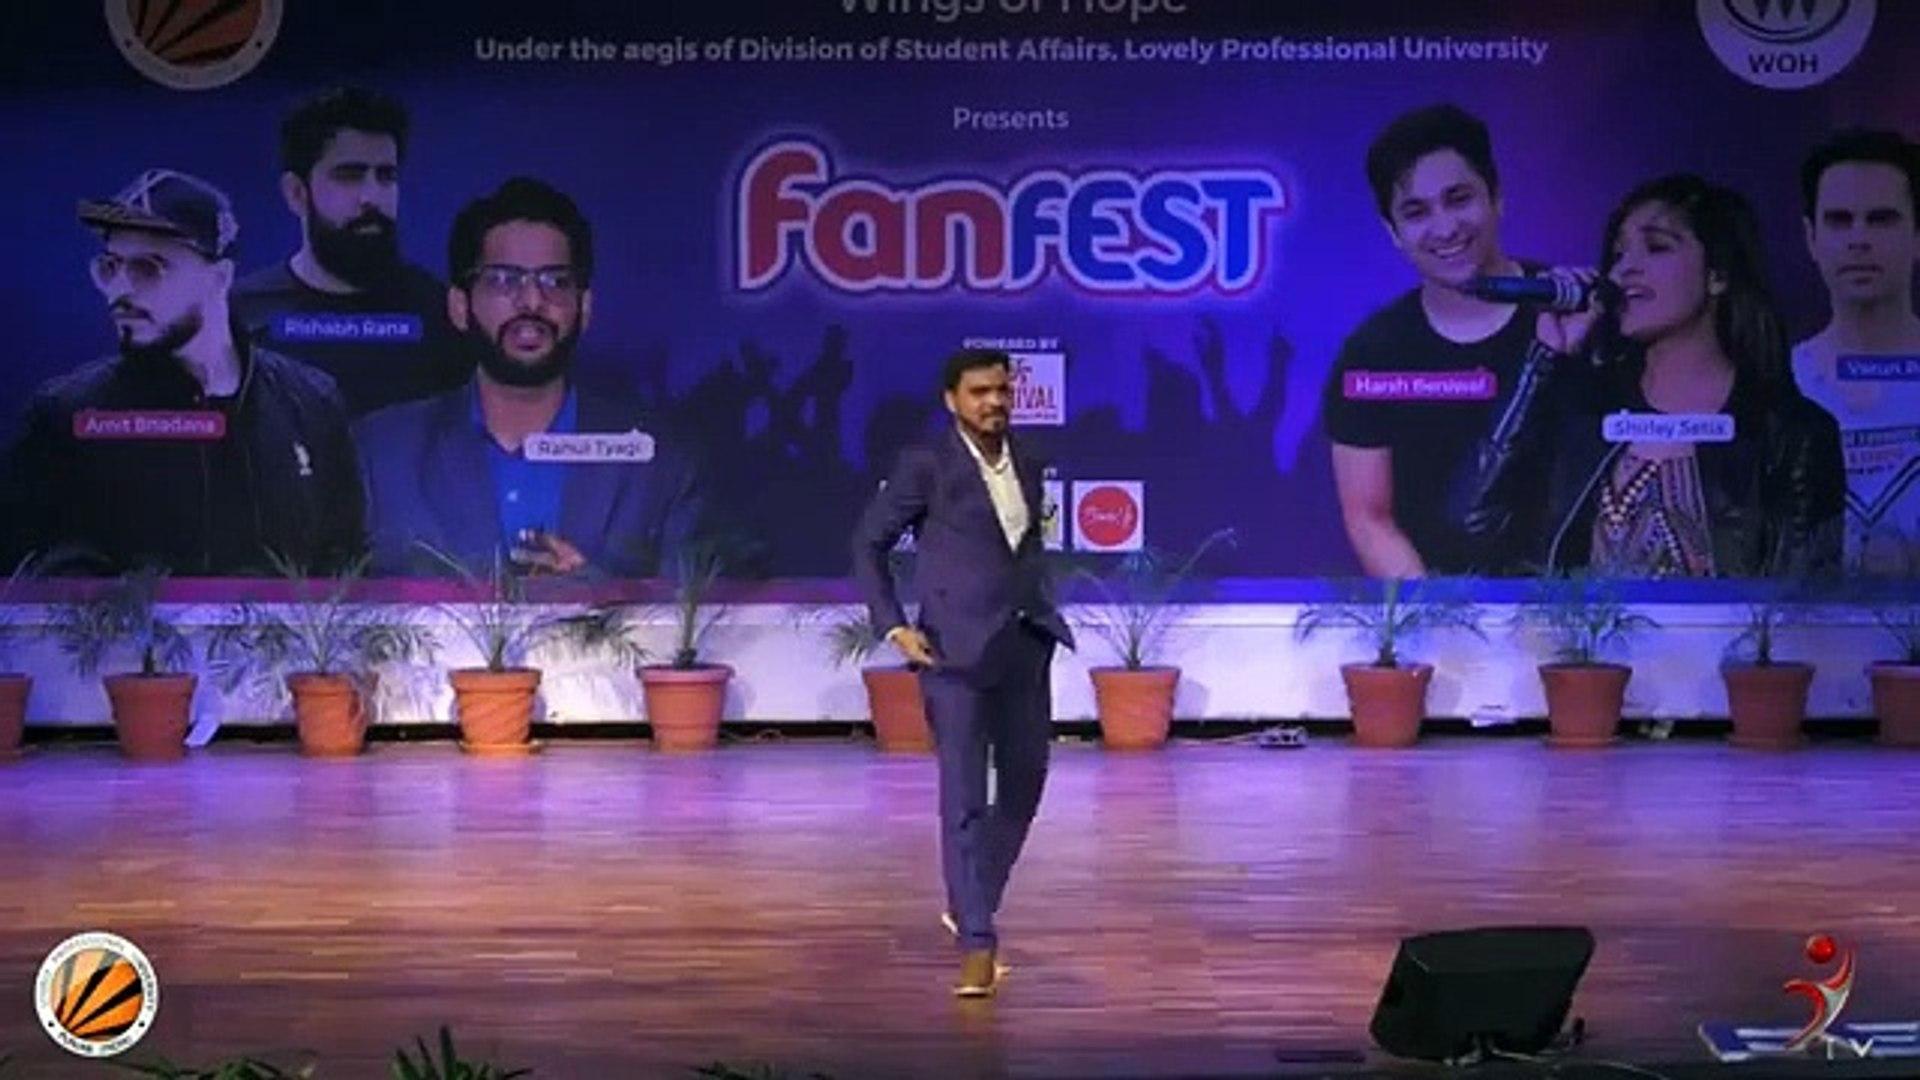 Amit Bhadana July 2020 - Fanfest - amit bhadana dub - amit bhadana video